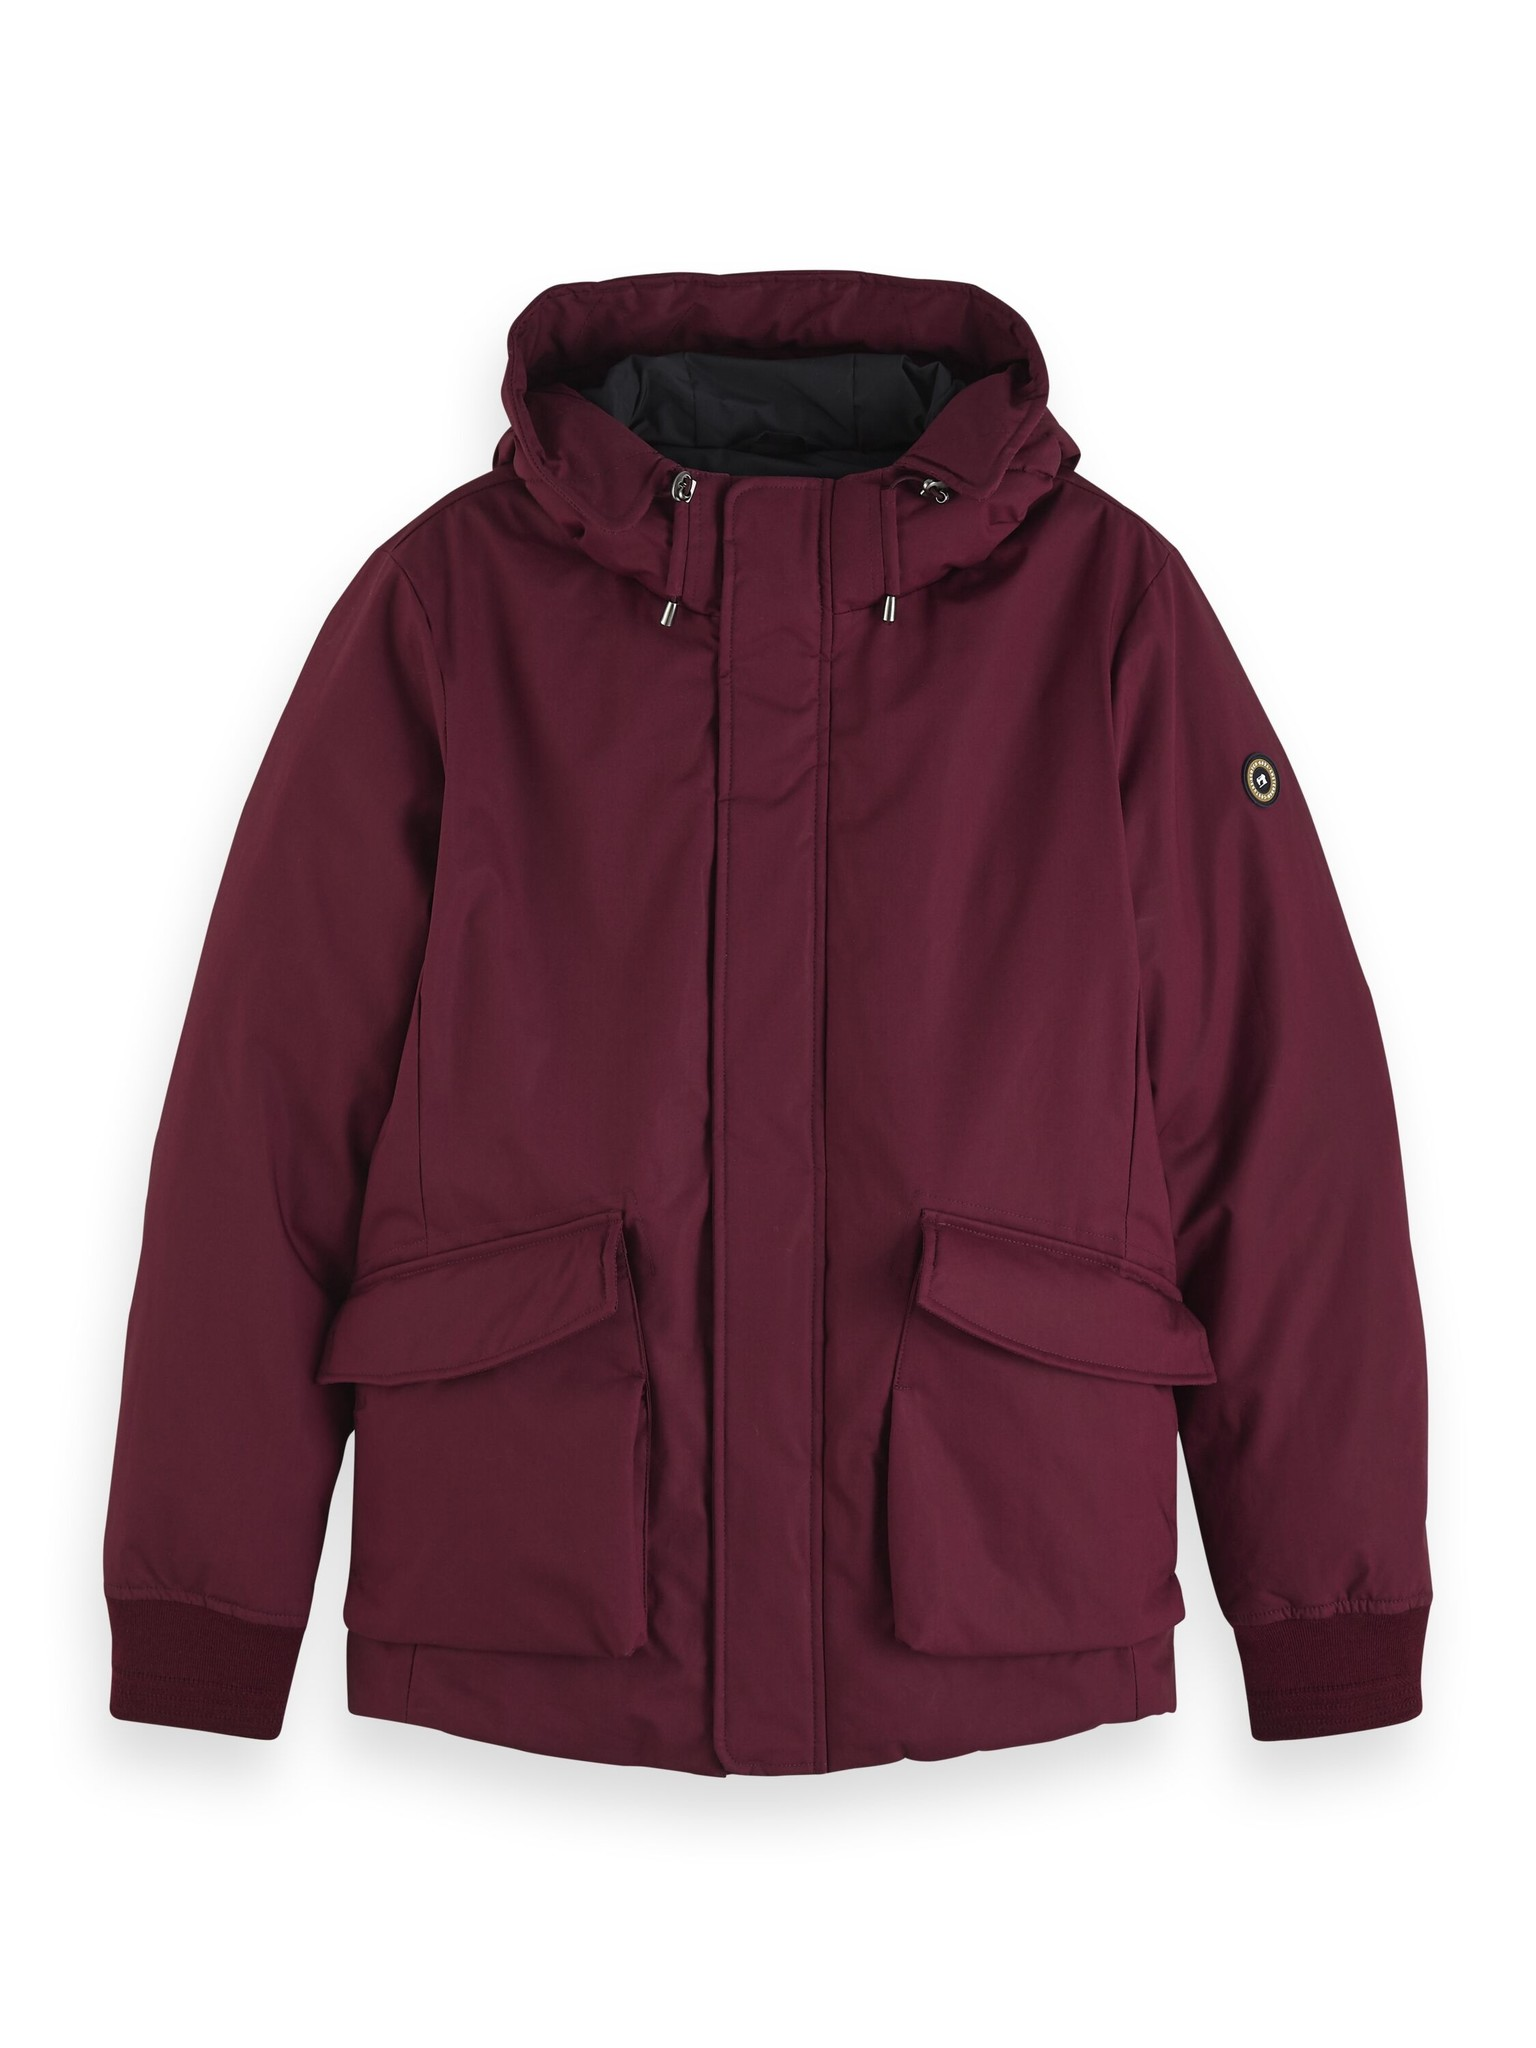 Scotch & Soda Short Hooded Jacket | 152030